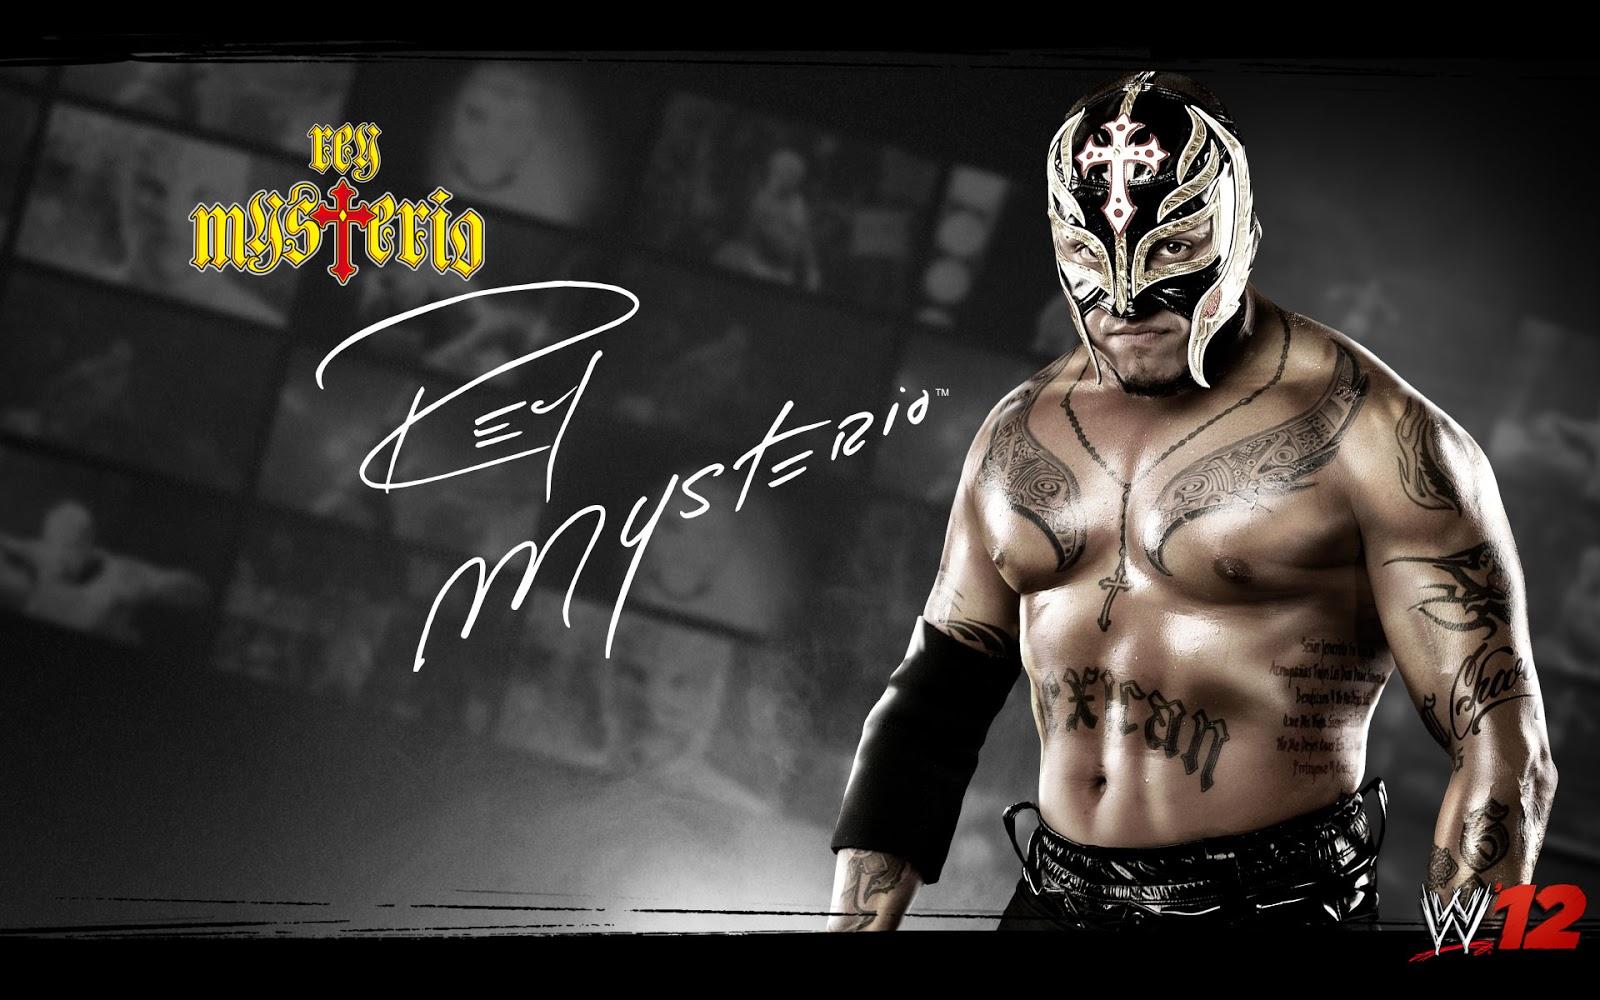 http://4.bp.blogspot.com/-sB_X5uTK-9k/UNI2wKxsy_I/AAAAAAAABh8/xTR6JrLBYVc/s1600/Wwe+Rey+Mysterio+619+Wallpaper+2012-3.jpg